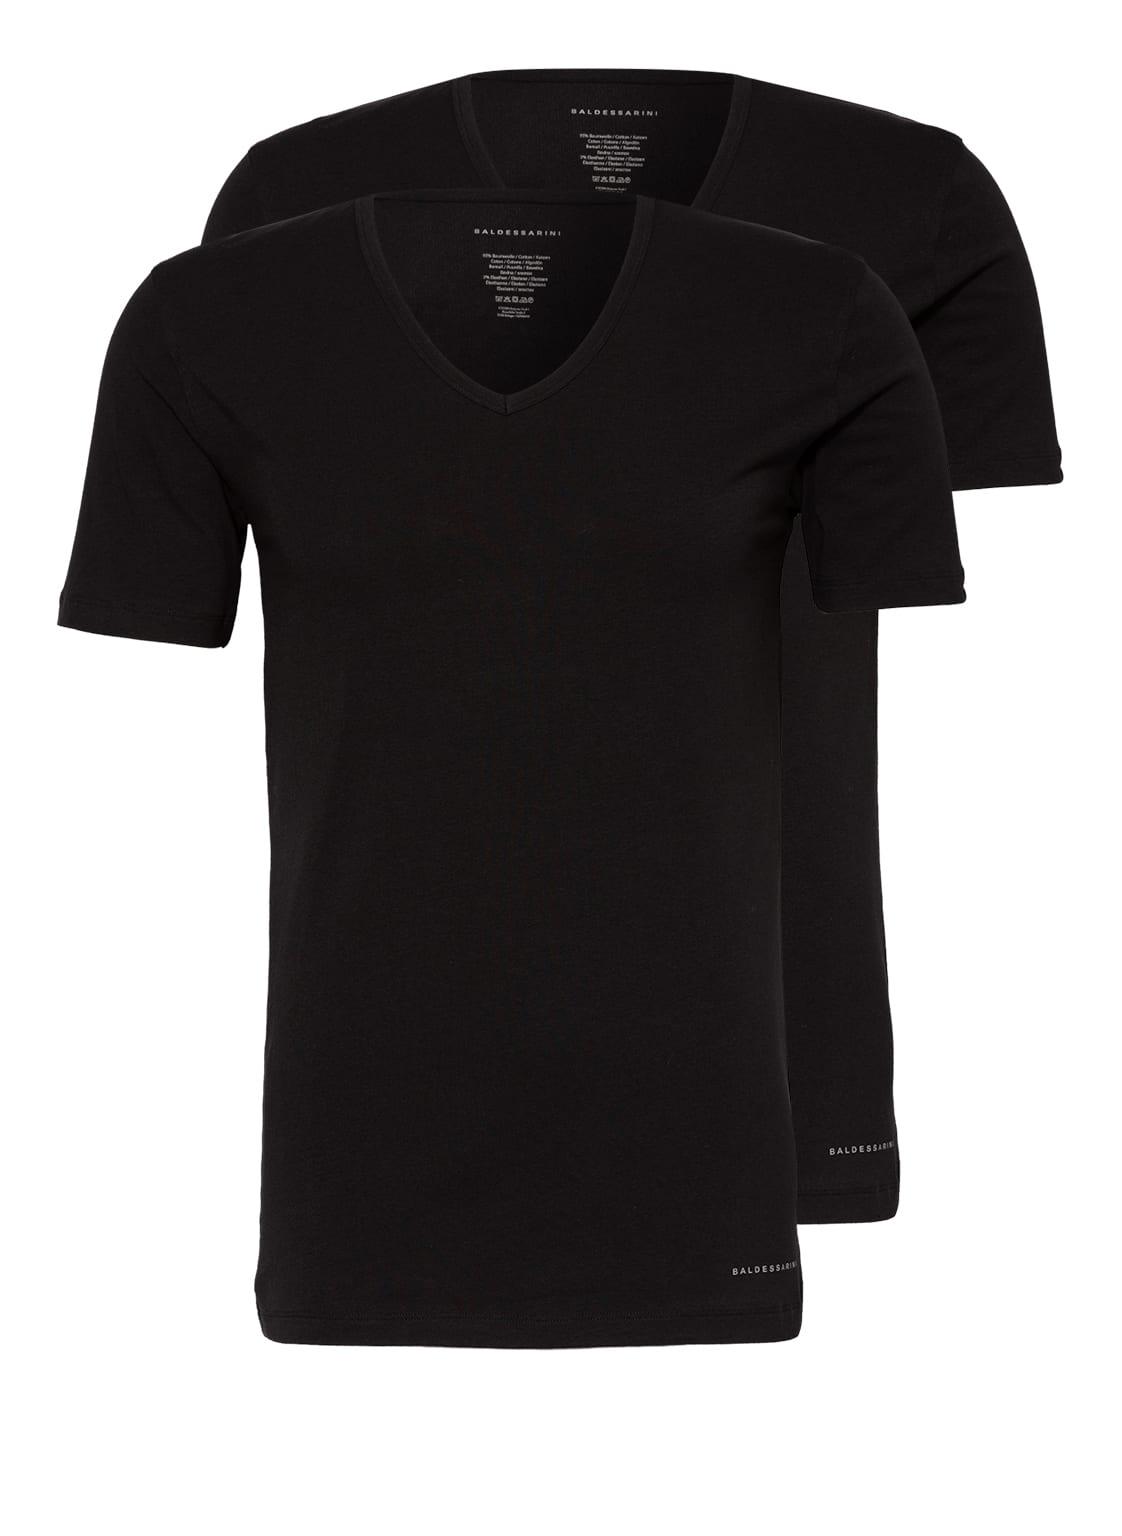 Image of Baldessarini 2er-Pack V-Shirts schwarz